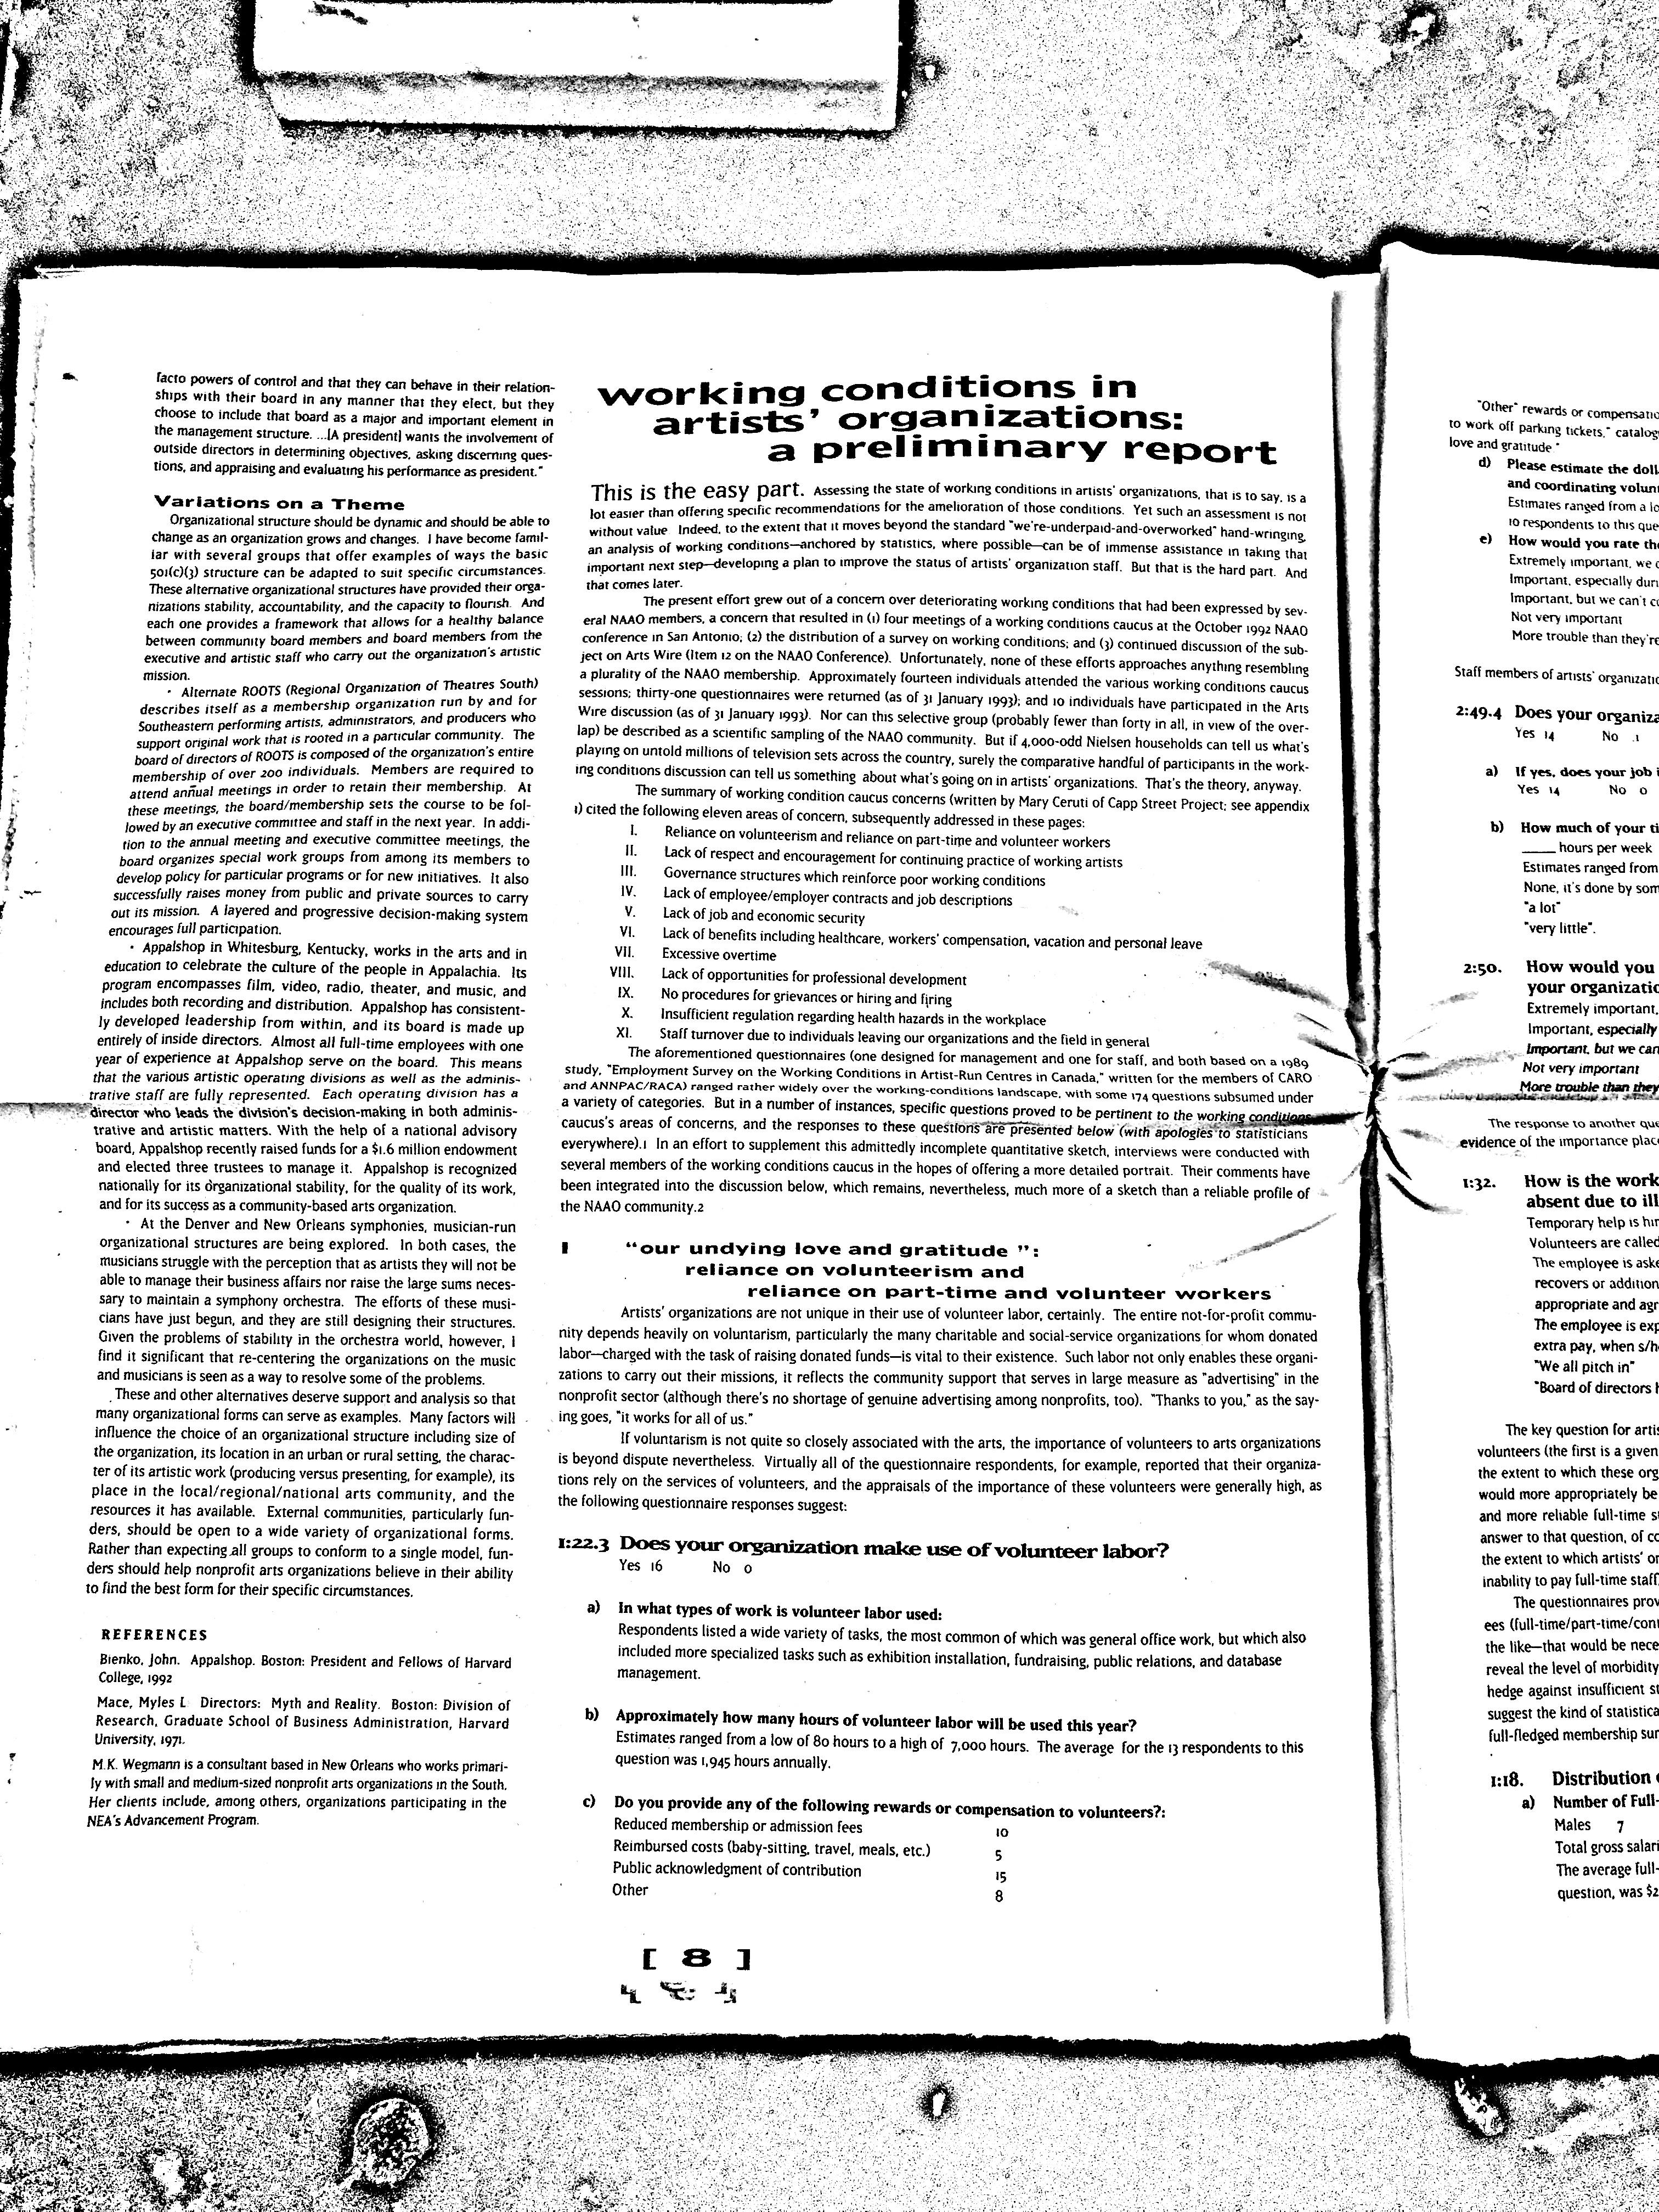 April 1993 - NAAO Bulletin Page 8.jpg